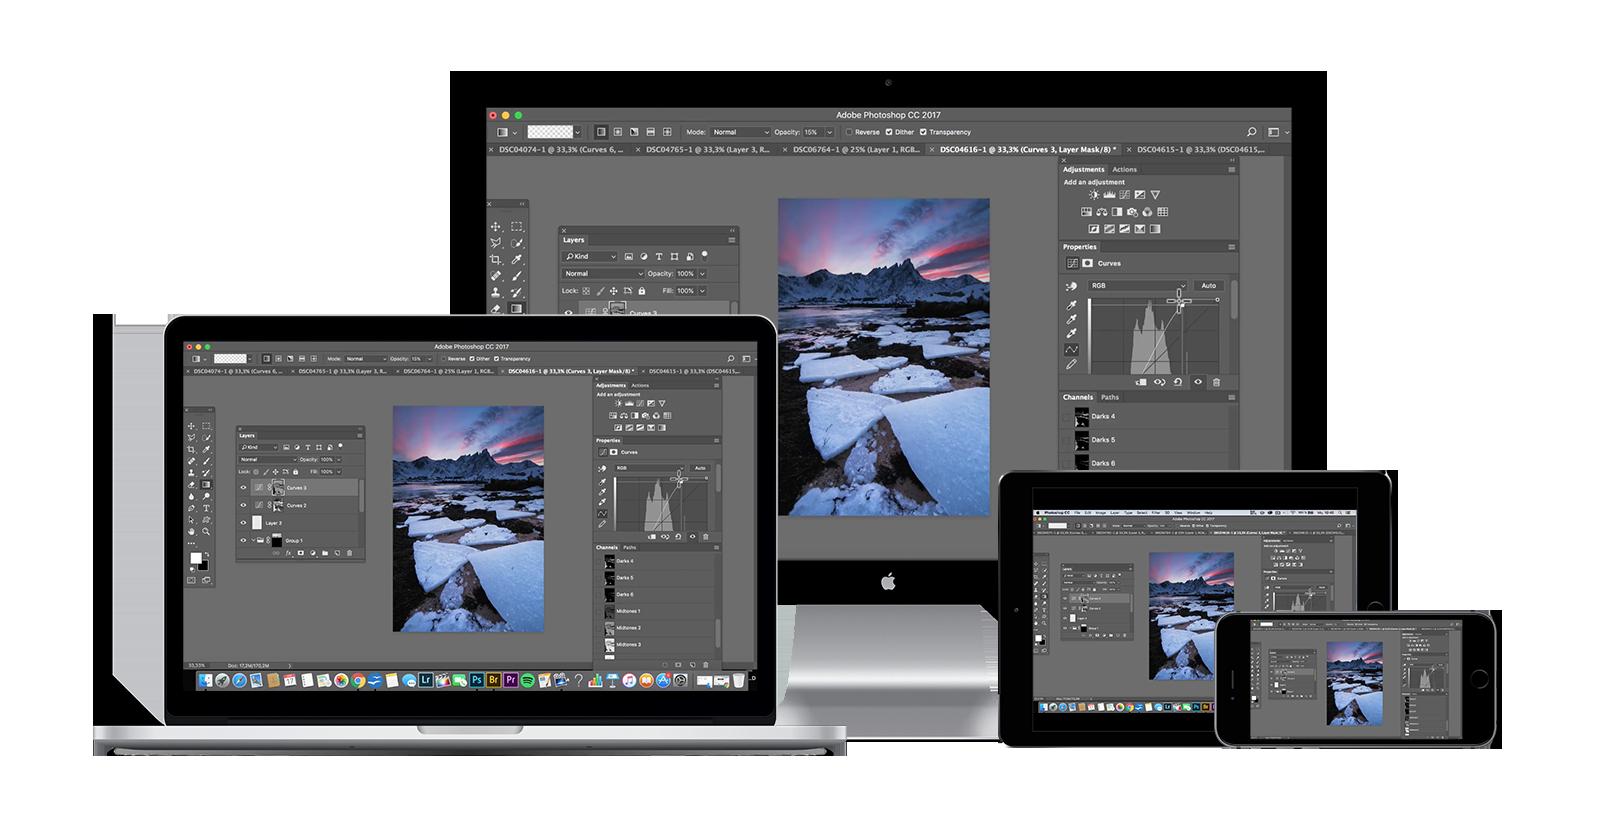 Benjamin Jaworskyj Landschaftsfotos mit Photoshop bearbeiten lernen Mockup